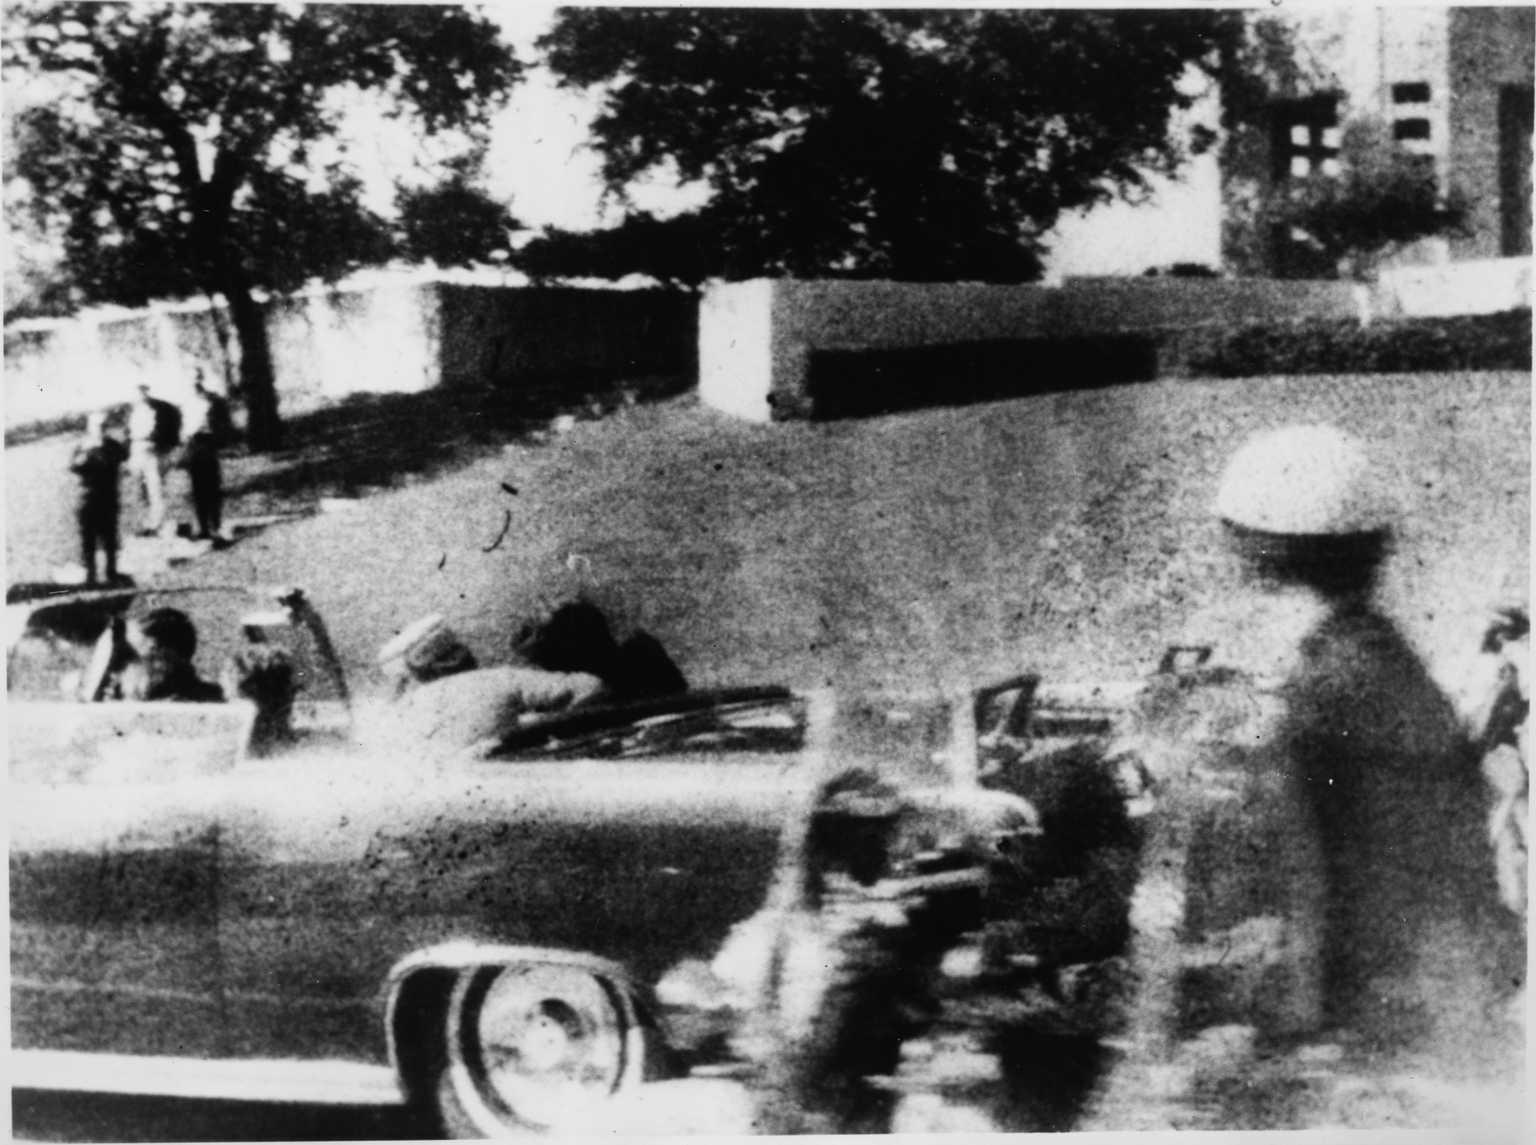 Moorman photo of JFK assassination